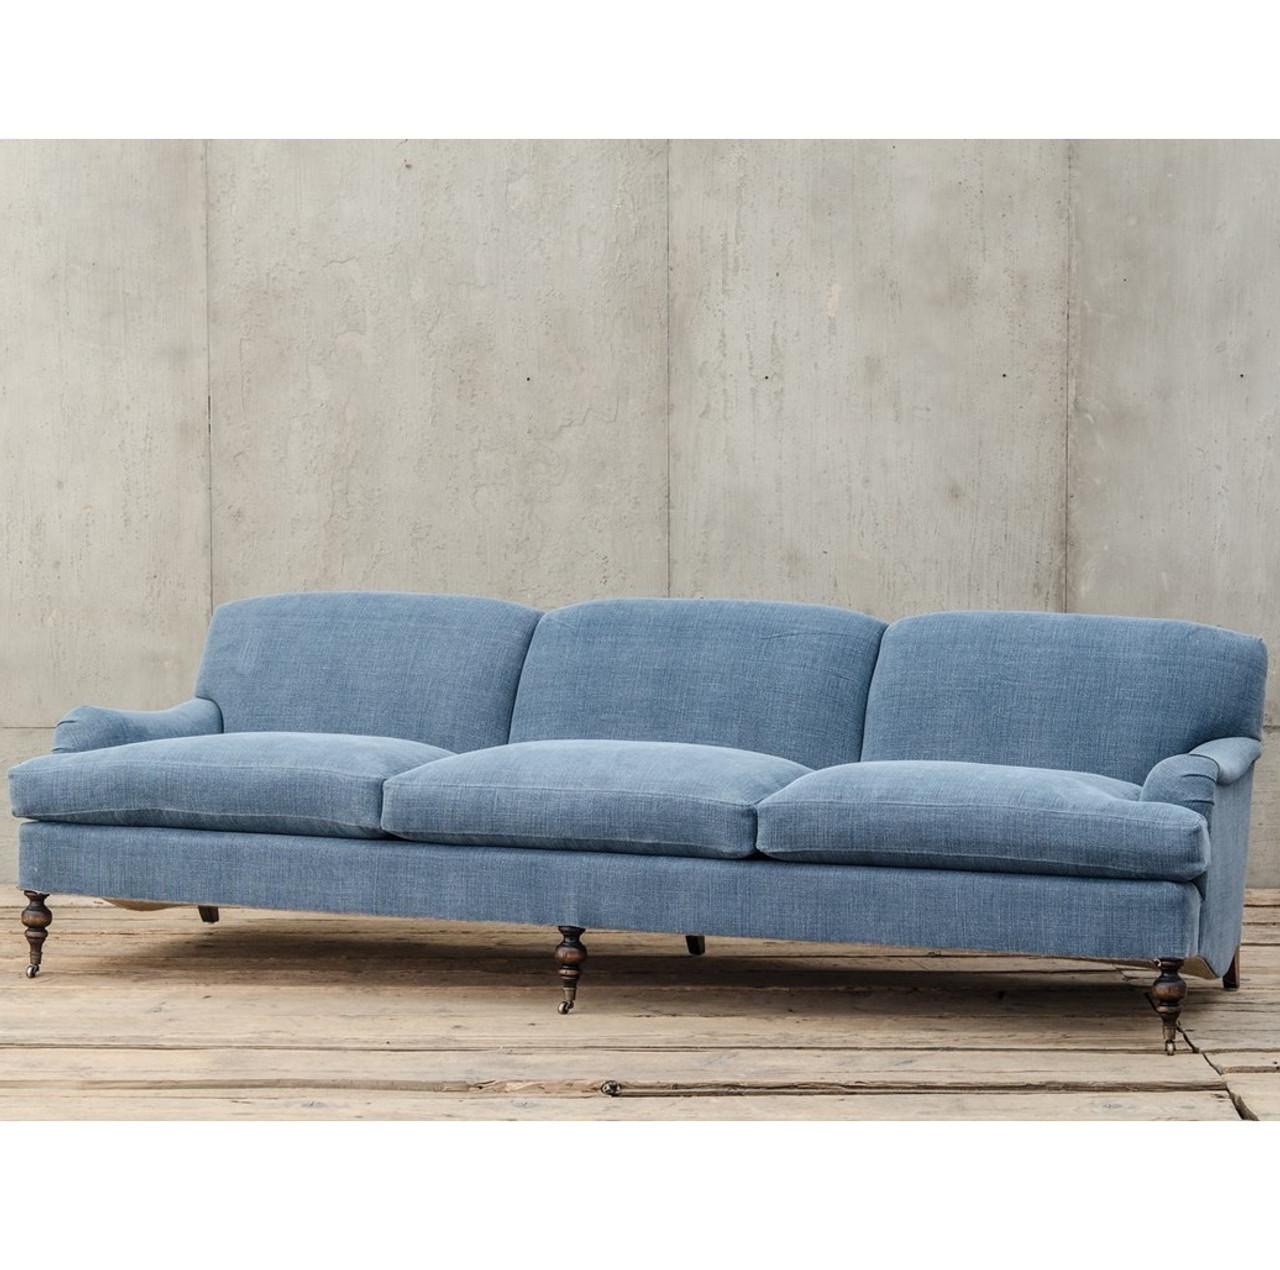 english roll arm sofa Professor Plum's Blue Linen Upholstered English Roll Arm Sofa  english roll arm sofa